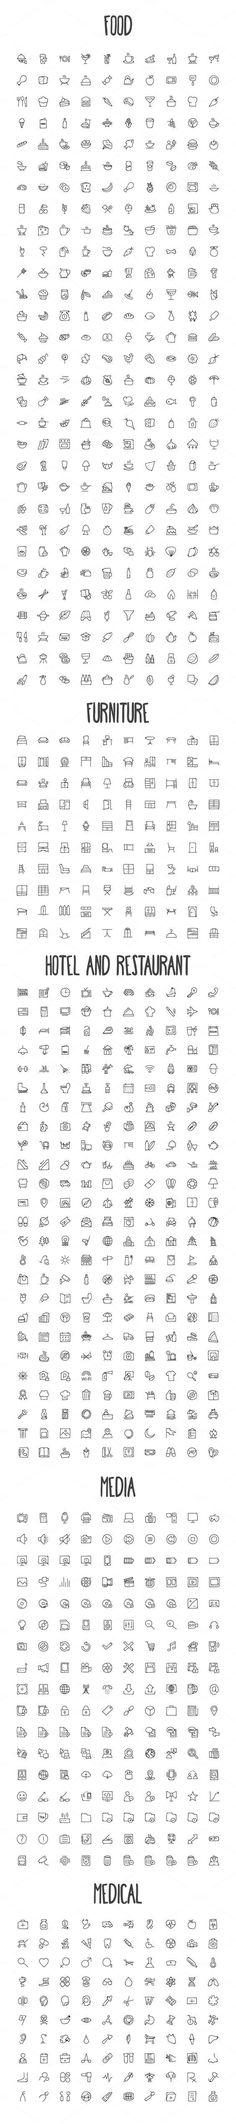 Tatto Ideas 2017 - 2440 Hand Drawn Doodle Icons Bundle